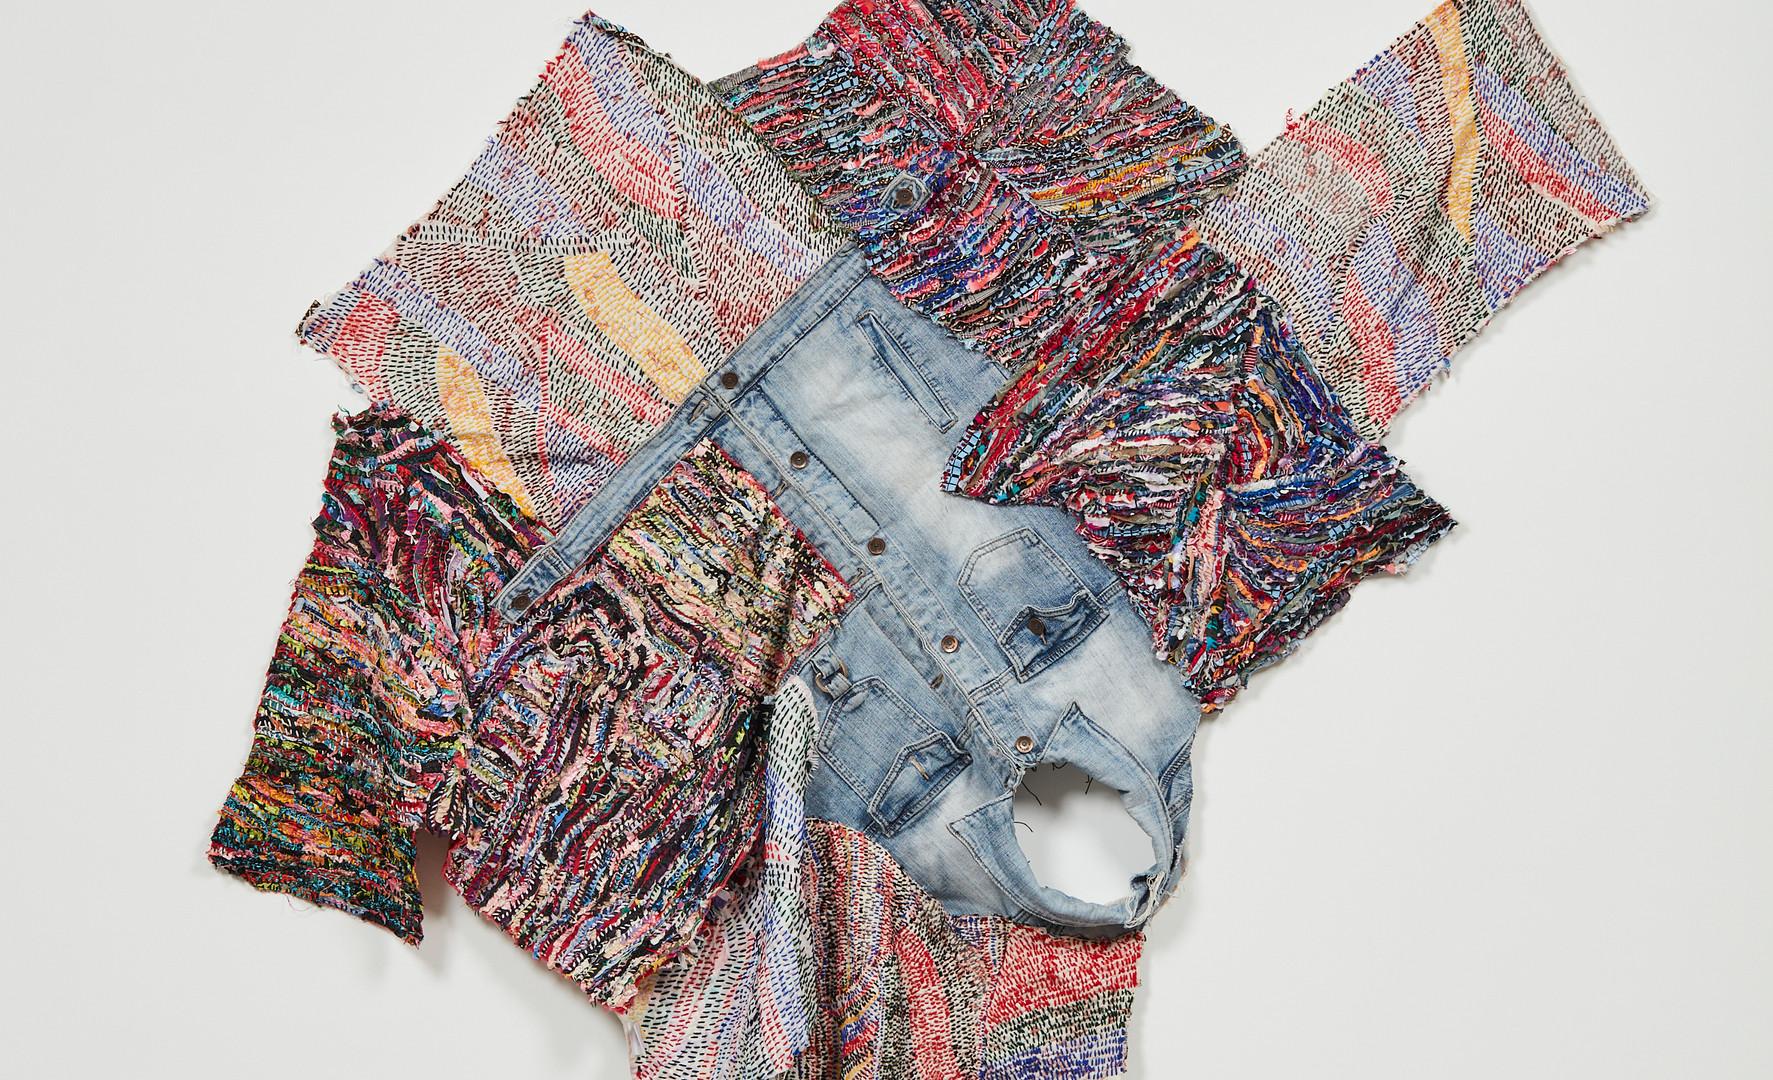 Georgina Maxim, 2020, Ma mère II, textile et technique mixte, 125 x 160 cm